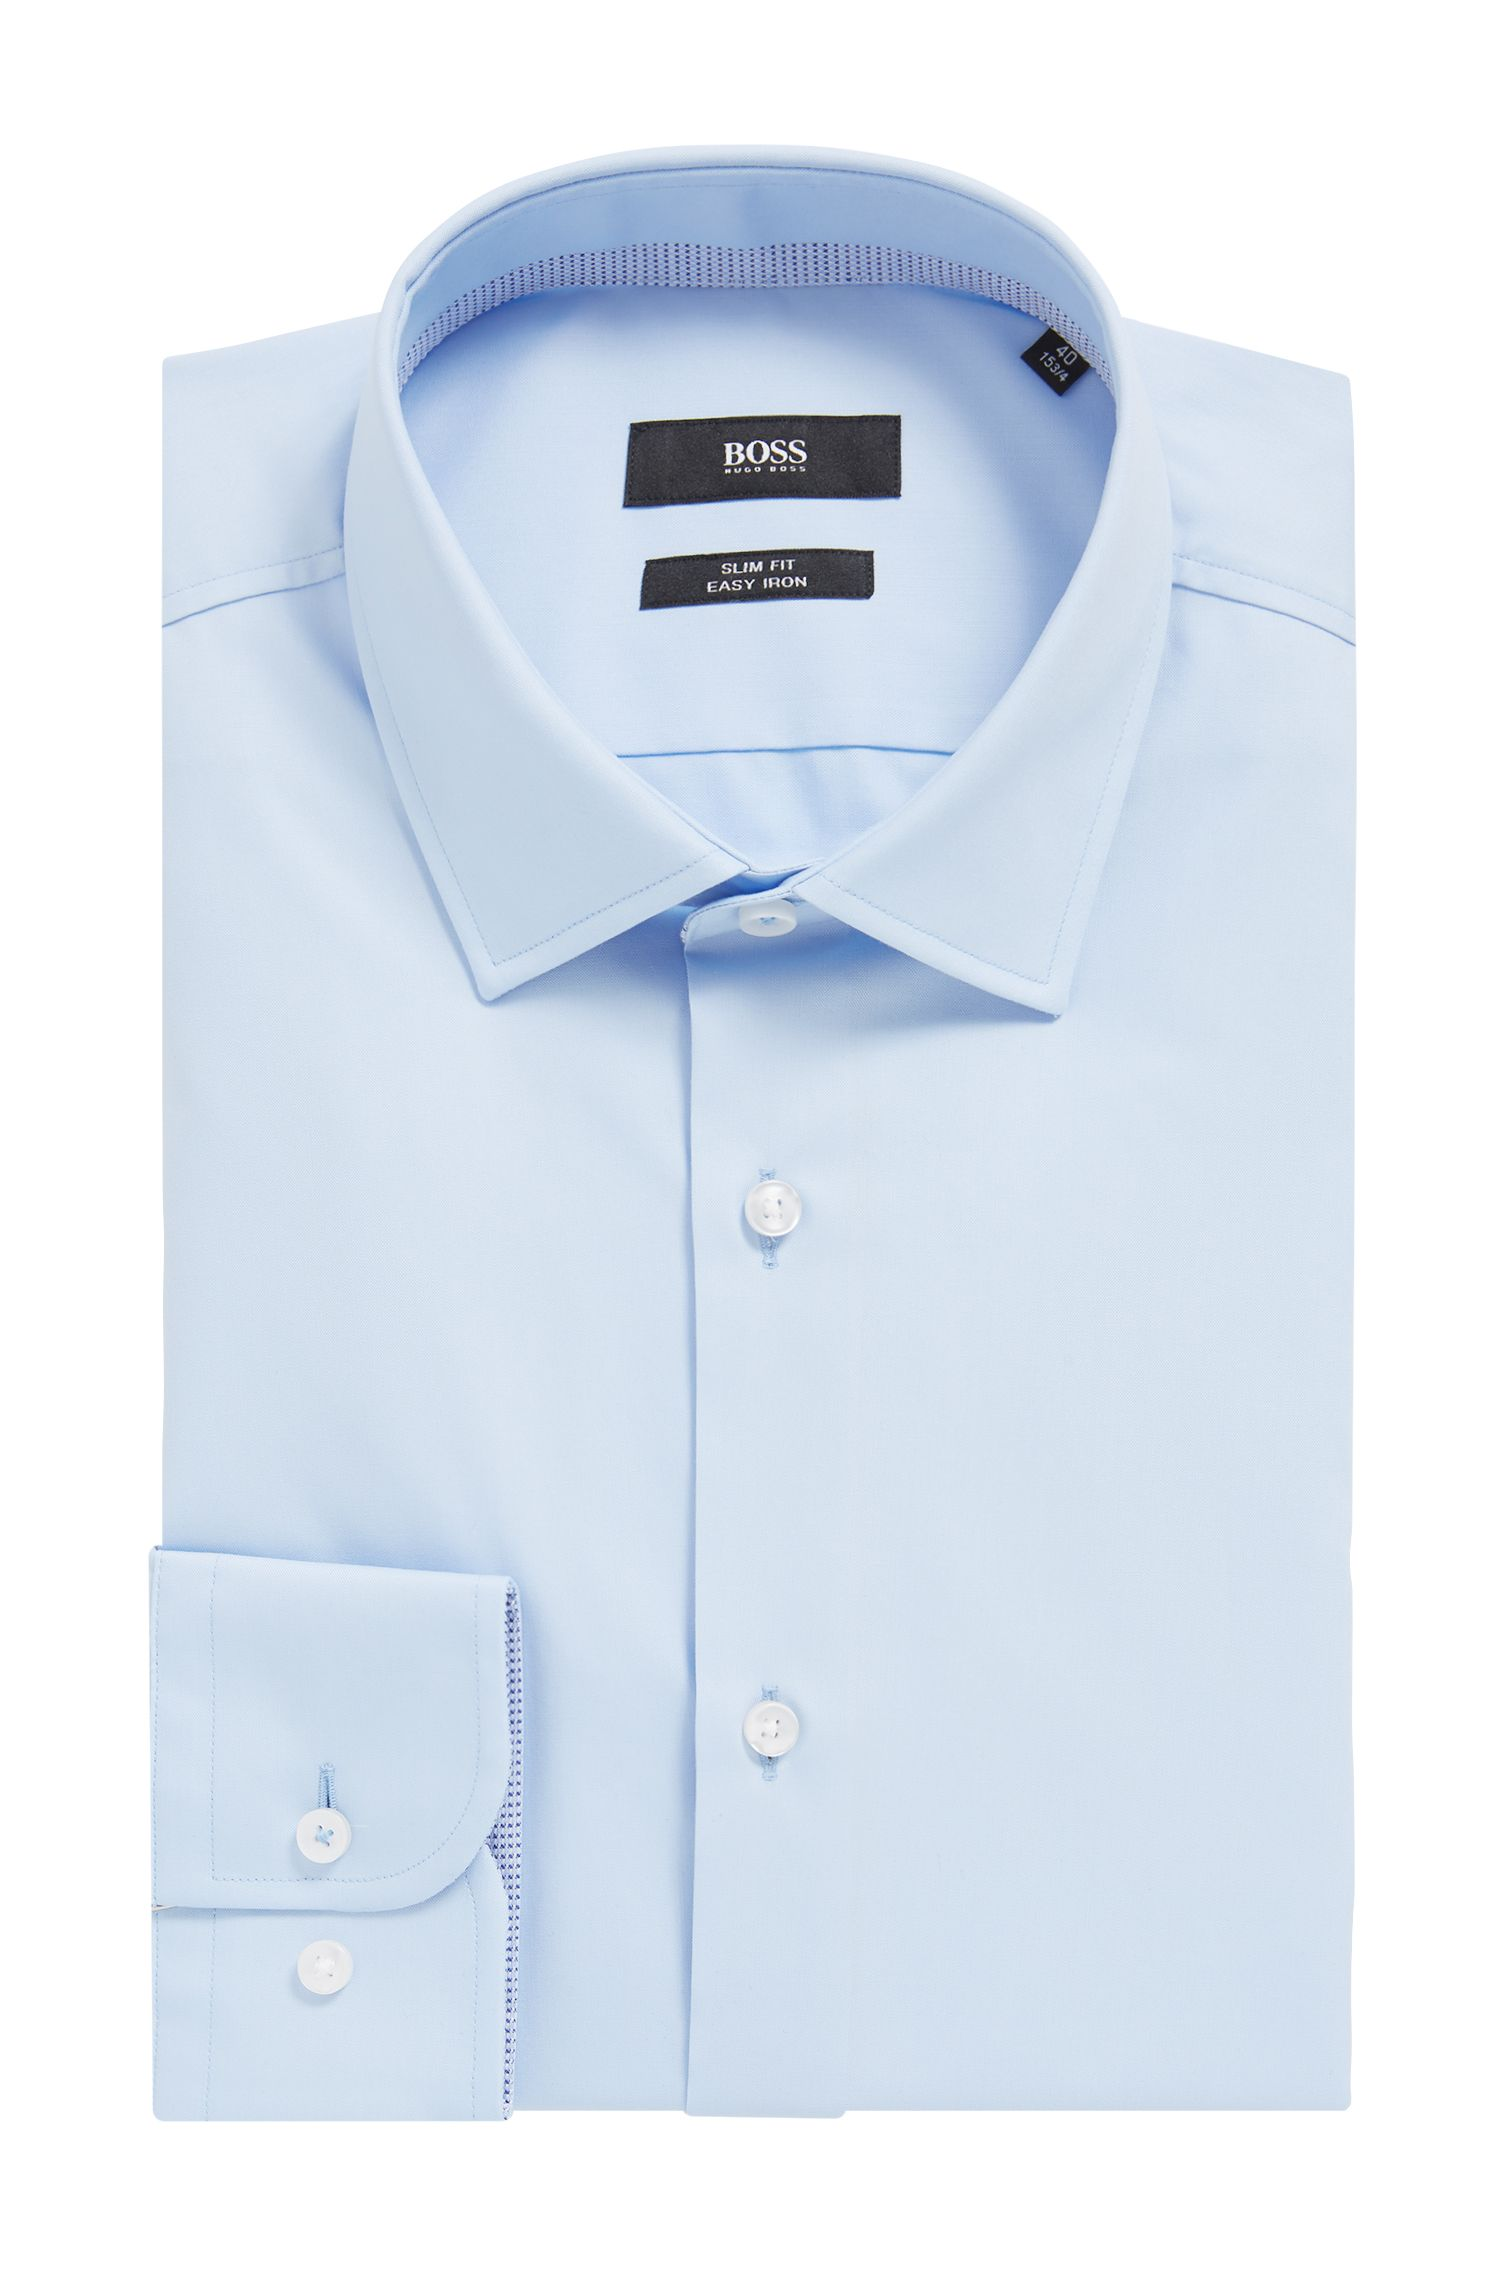 Slim-fit shirt in easy-iron Austrian cotton poplin